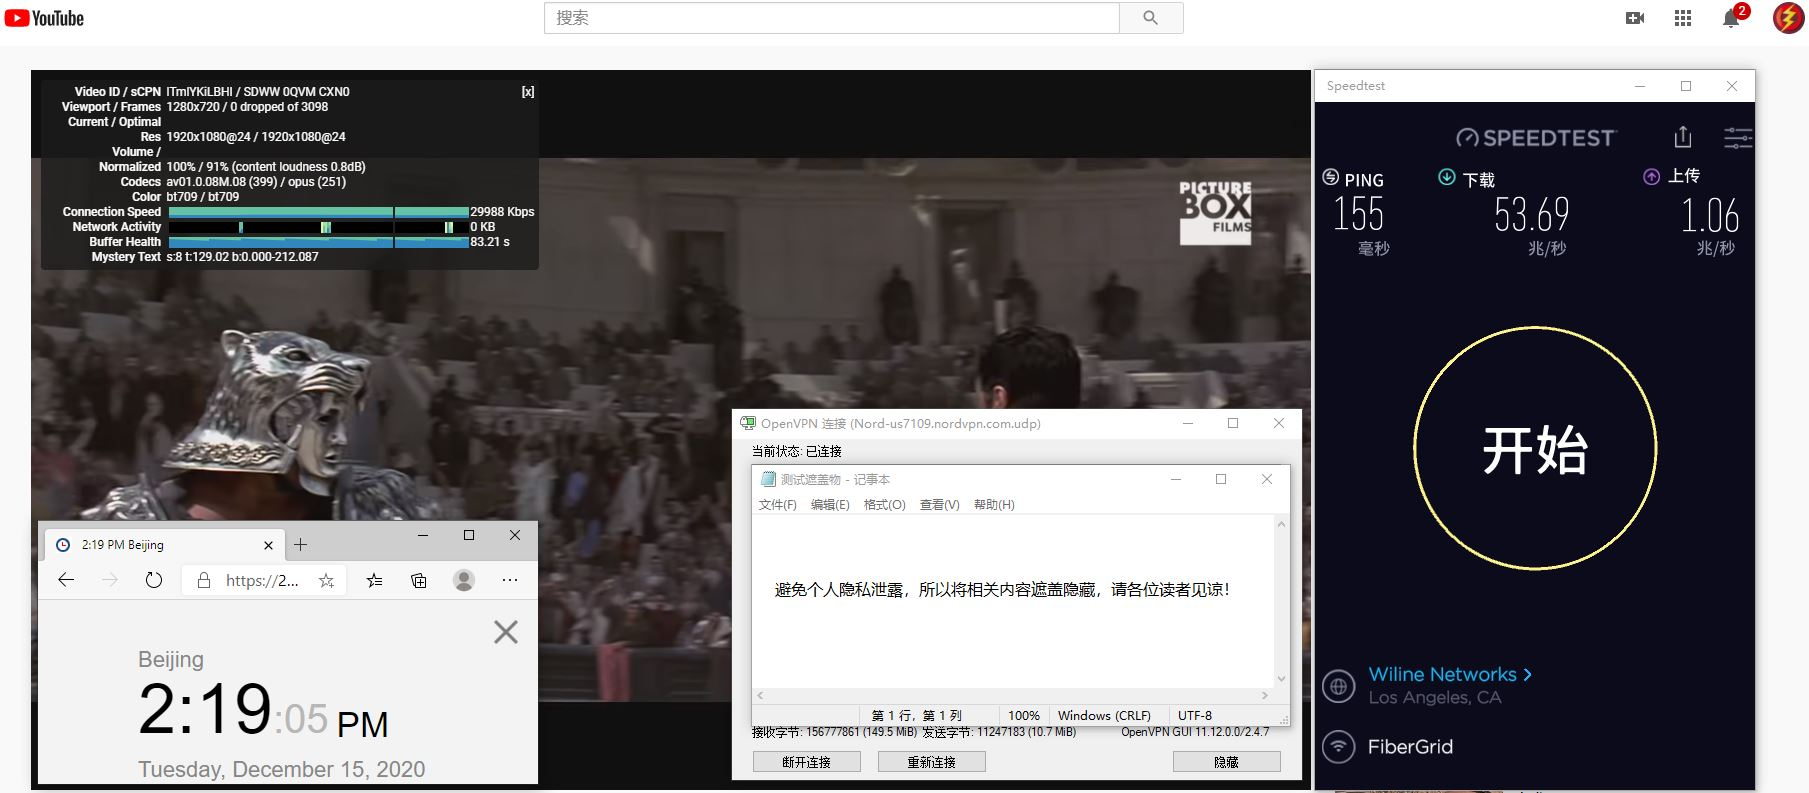 Windows10 NordVPN OpenVPN Gui US7109 服务器 中国VPN 翻墙 科学上网 测试 - 20201215